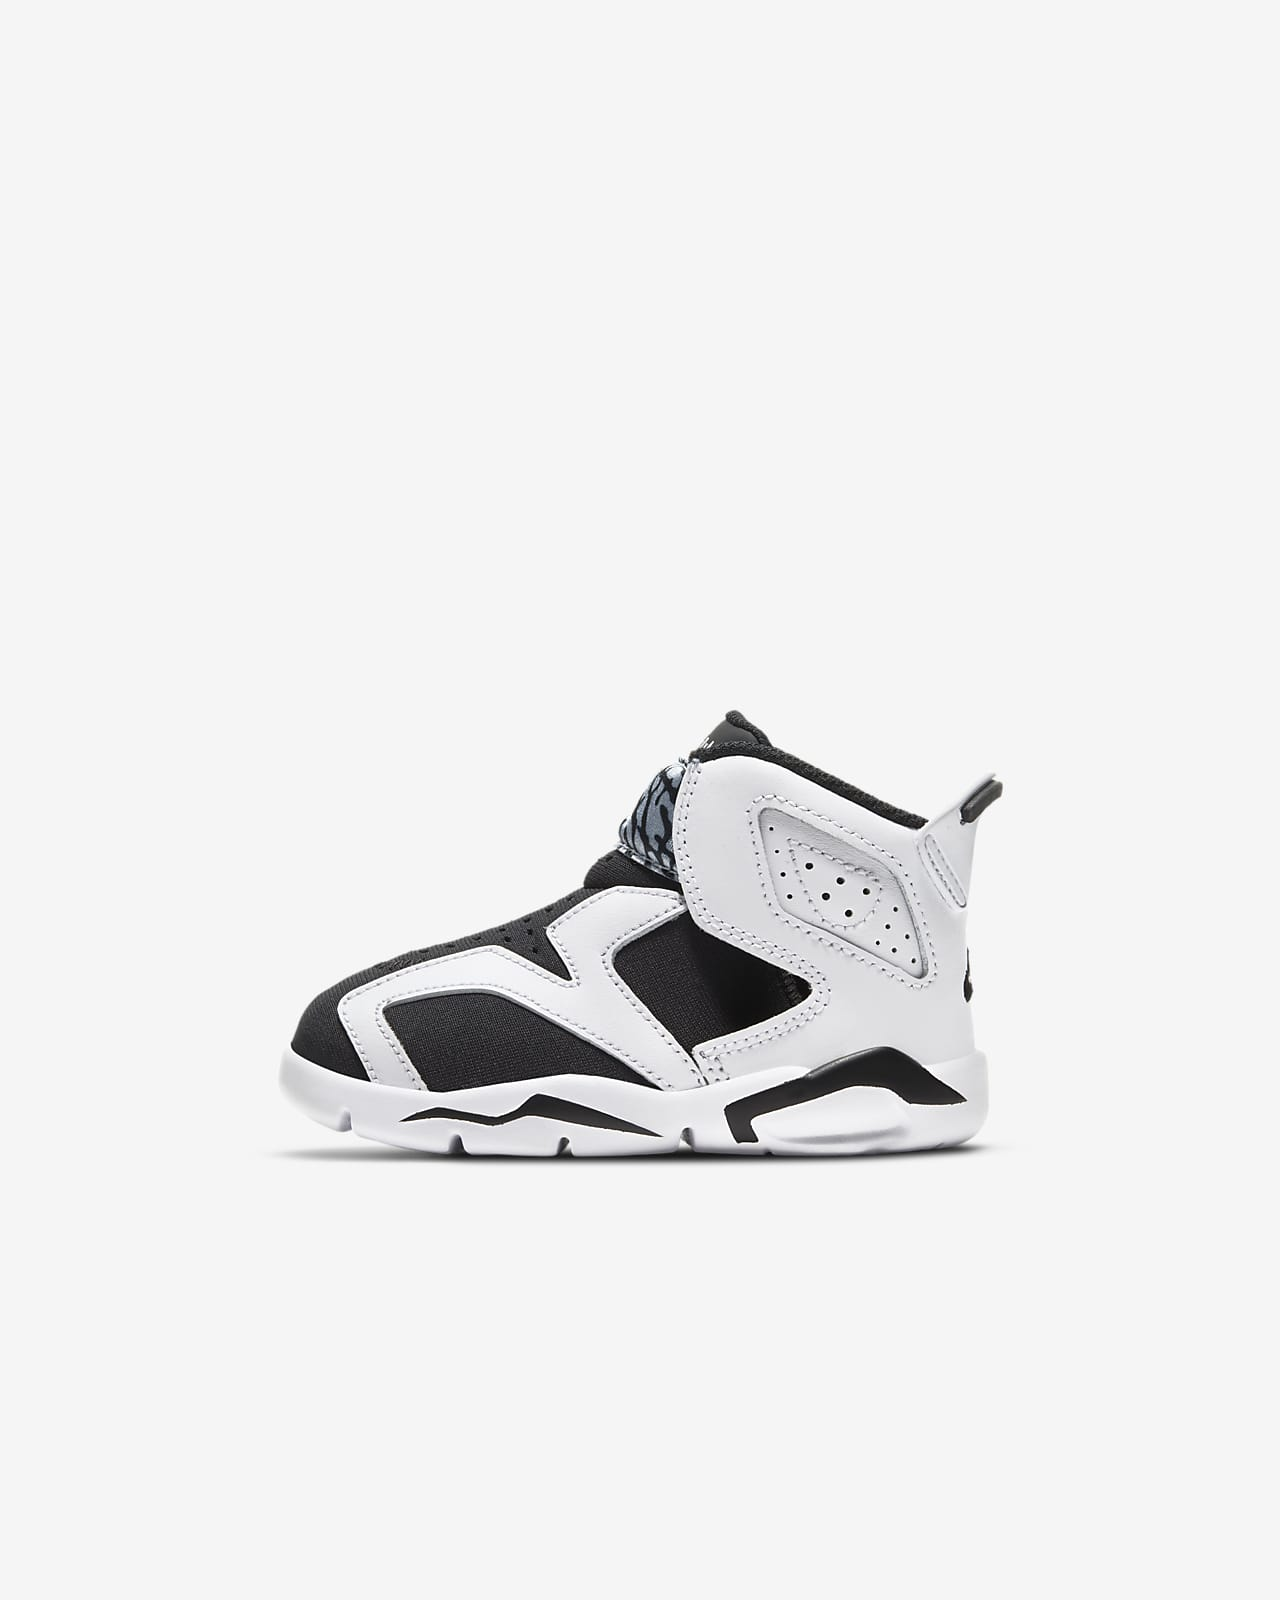 Jordan 6 Retro Little Flex Baby & Toddler Shoe